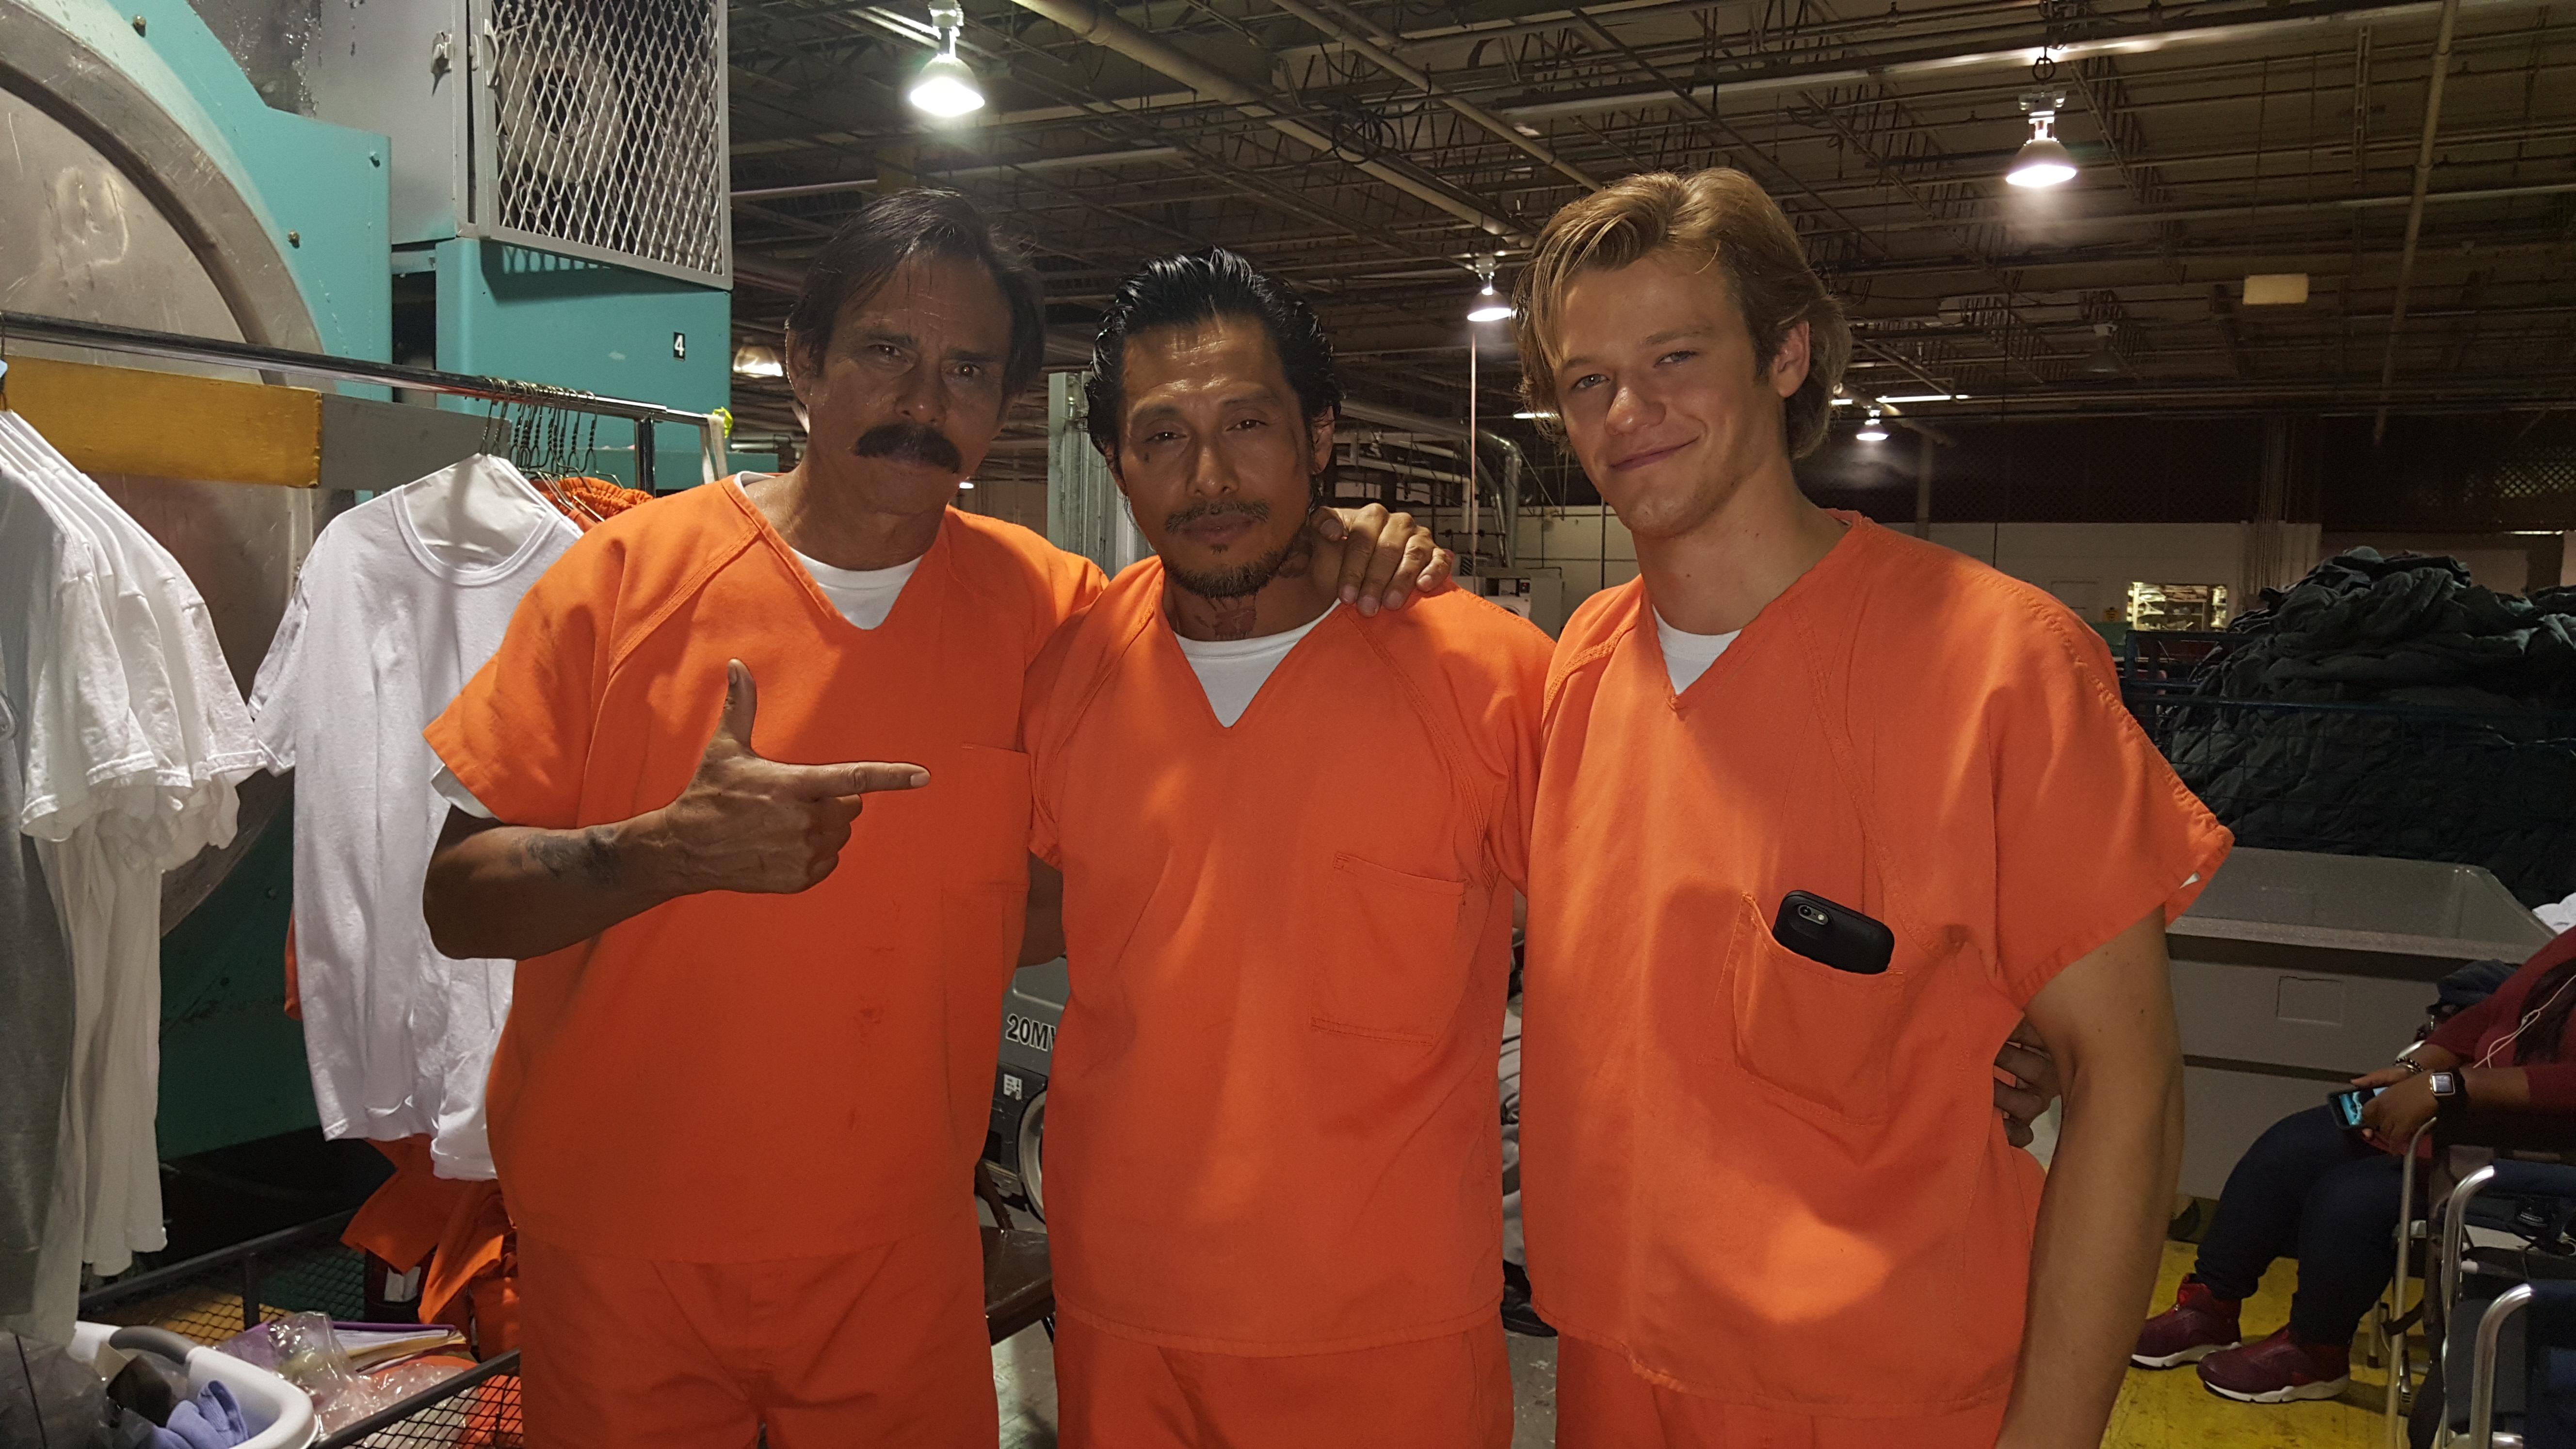 SAM MEDINA AND LUCAS TILL AND RAOUL MAX TRUJILLO ON SET OF MACGYVER TV SERIES 2016